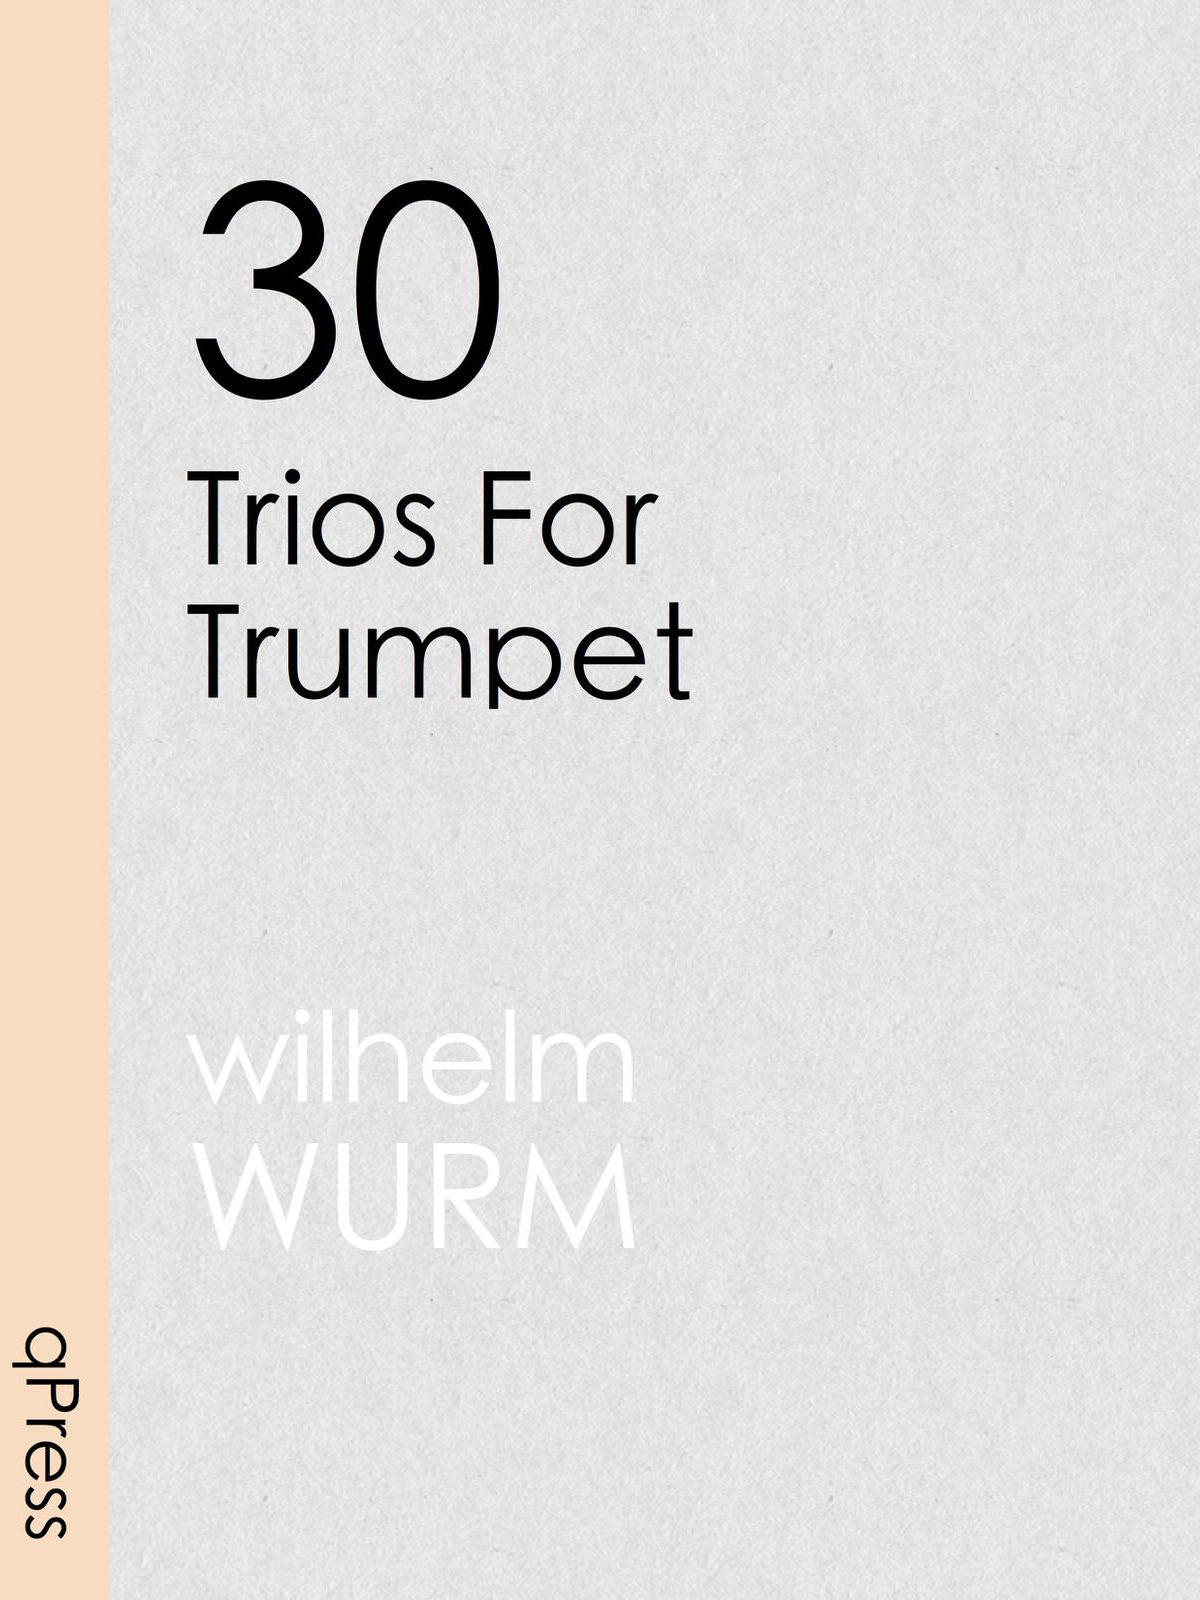 wurm-30-trios-for-trumpet